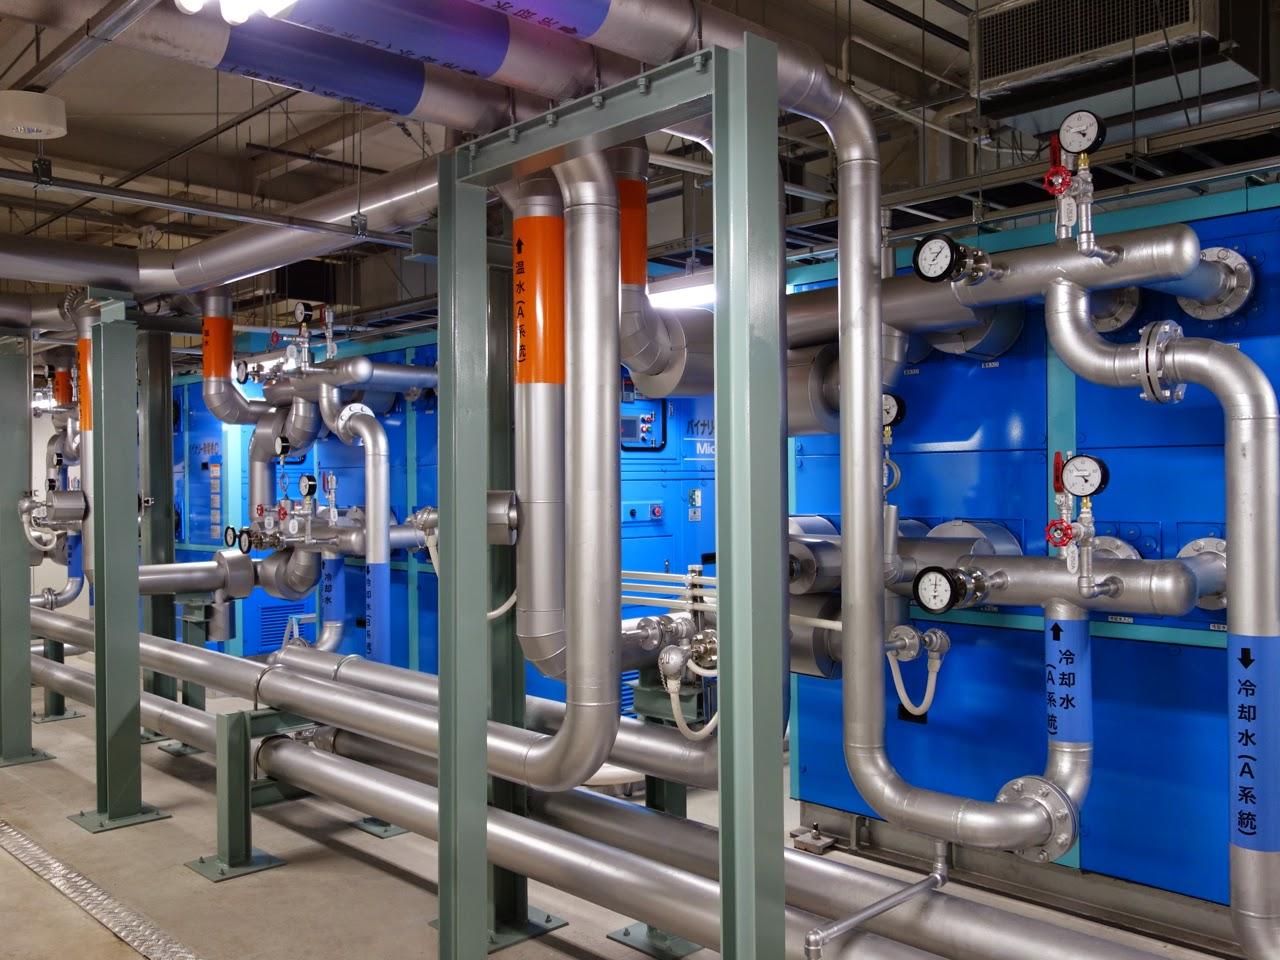 小型地熱・温泉発電の可能性(12):小浜温泉バイナリー発電実証事業結果